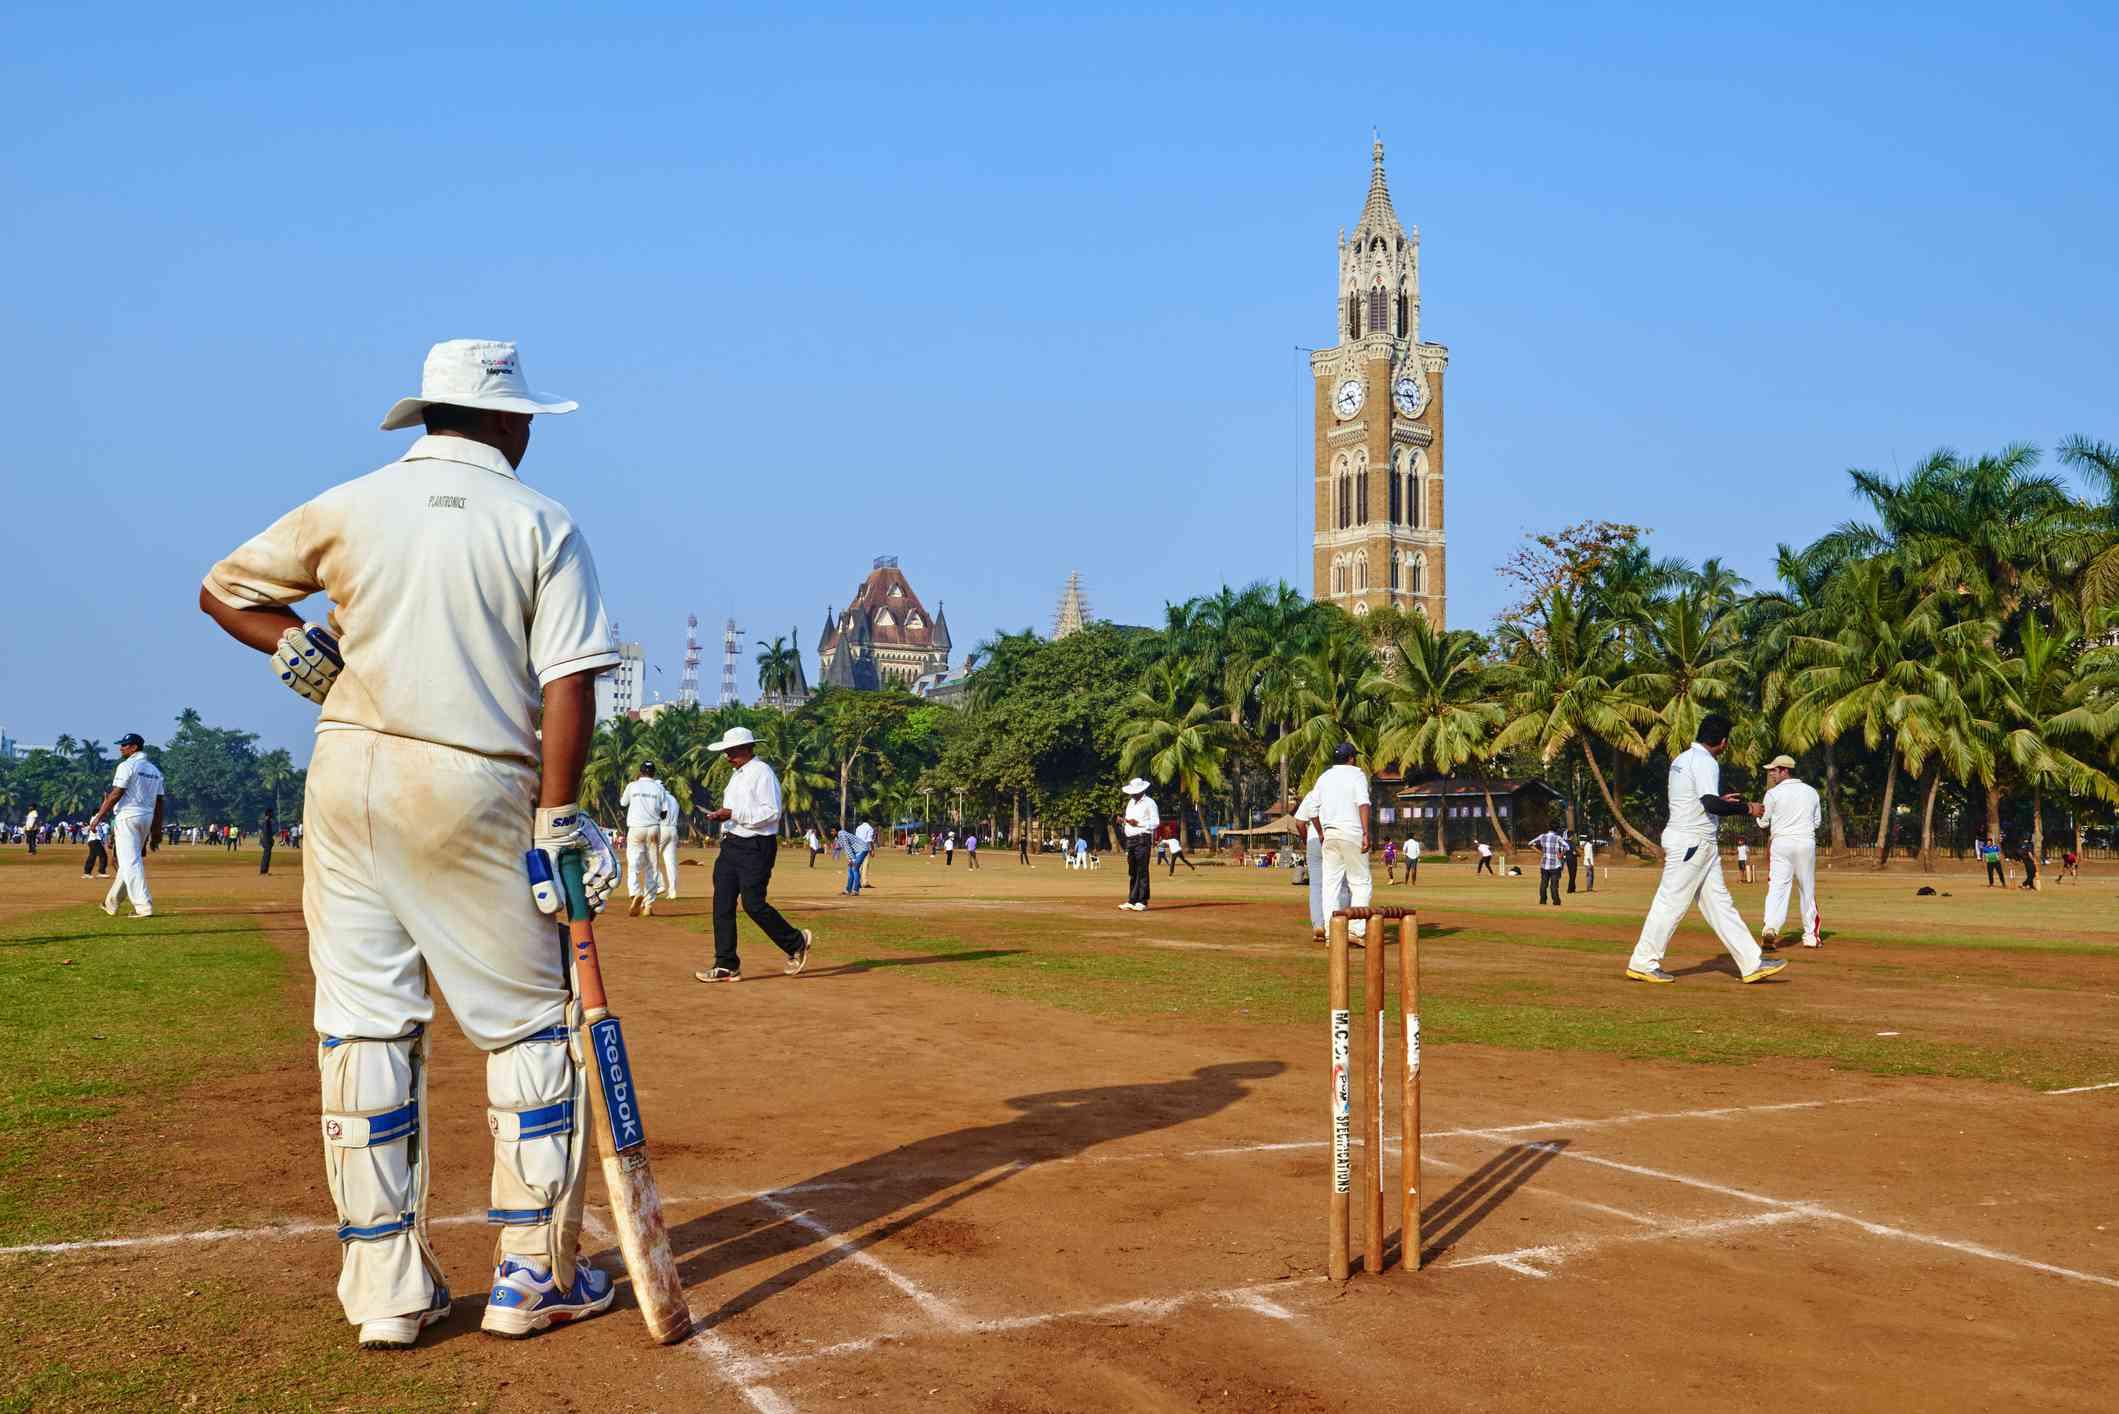 Oval Maidan, Mumbai. Cricket game.